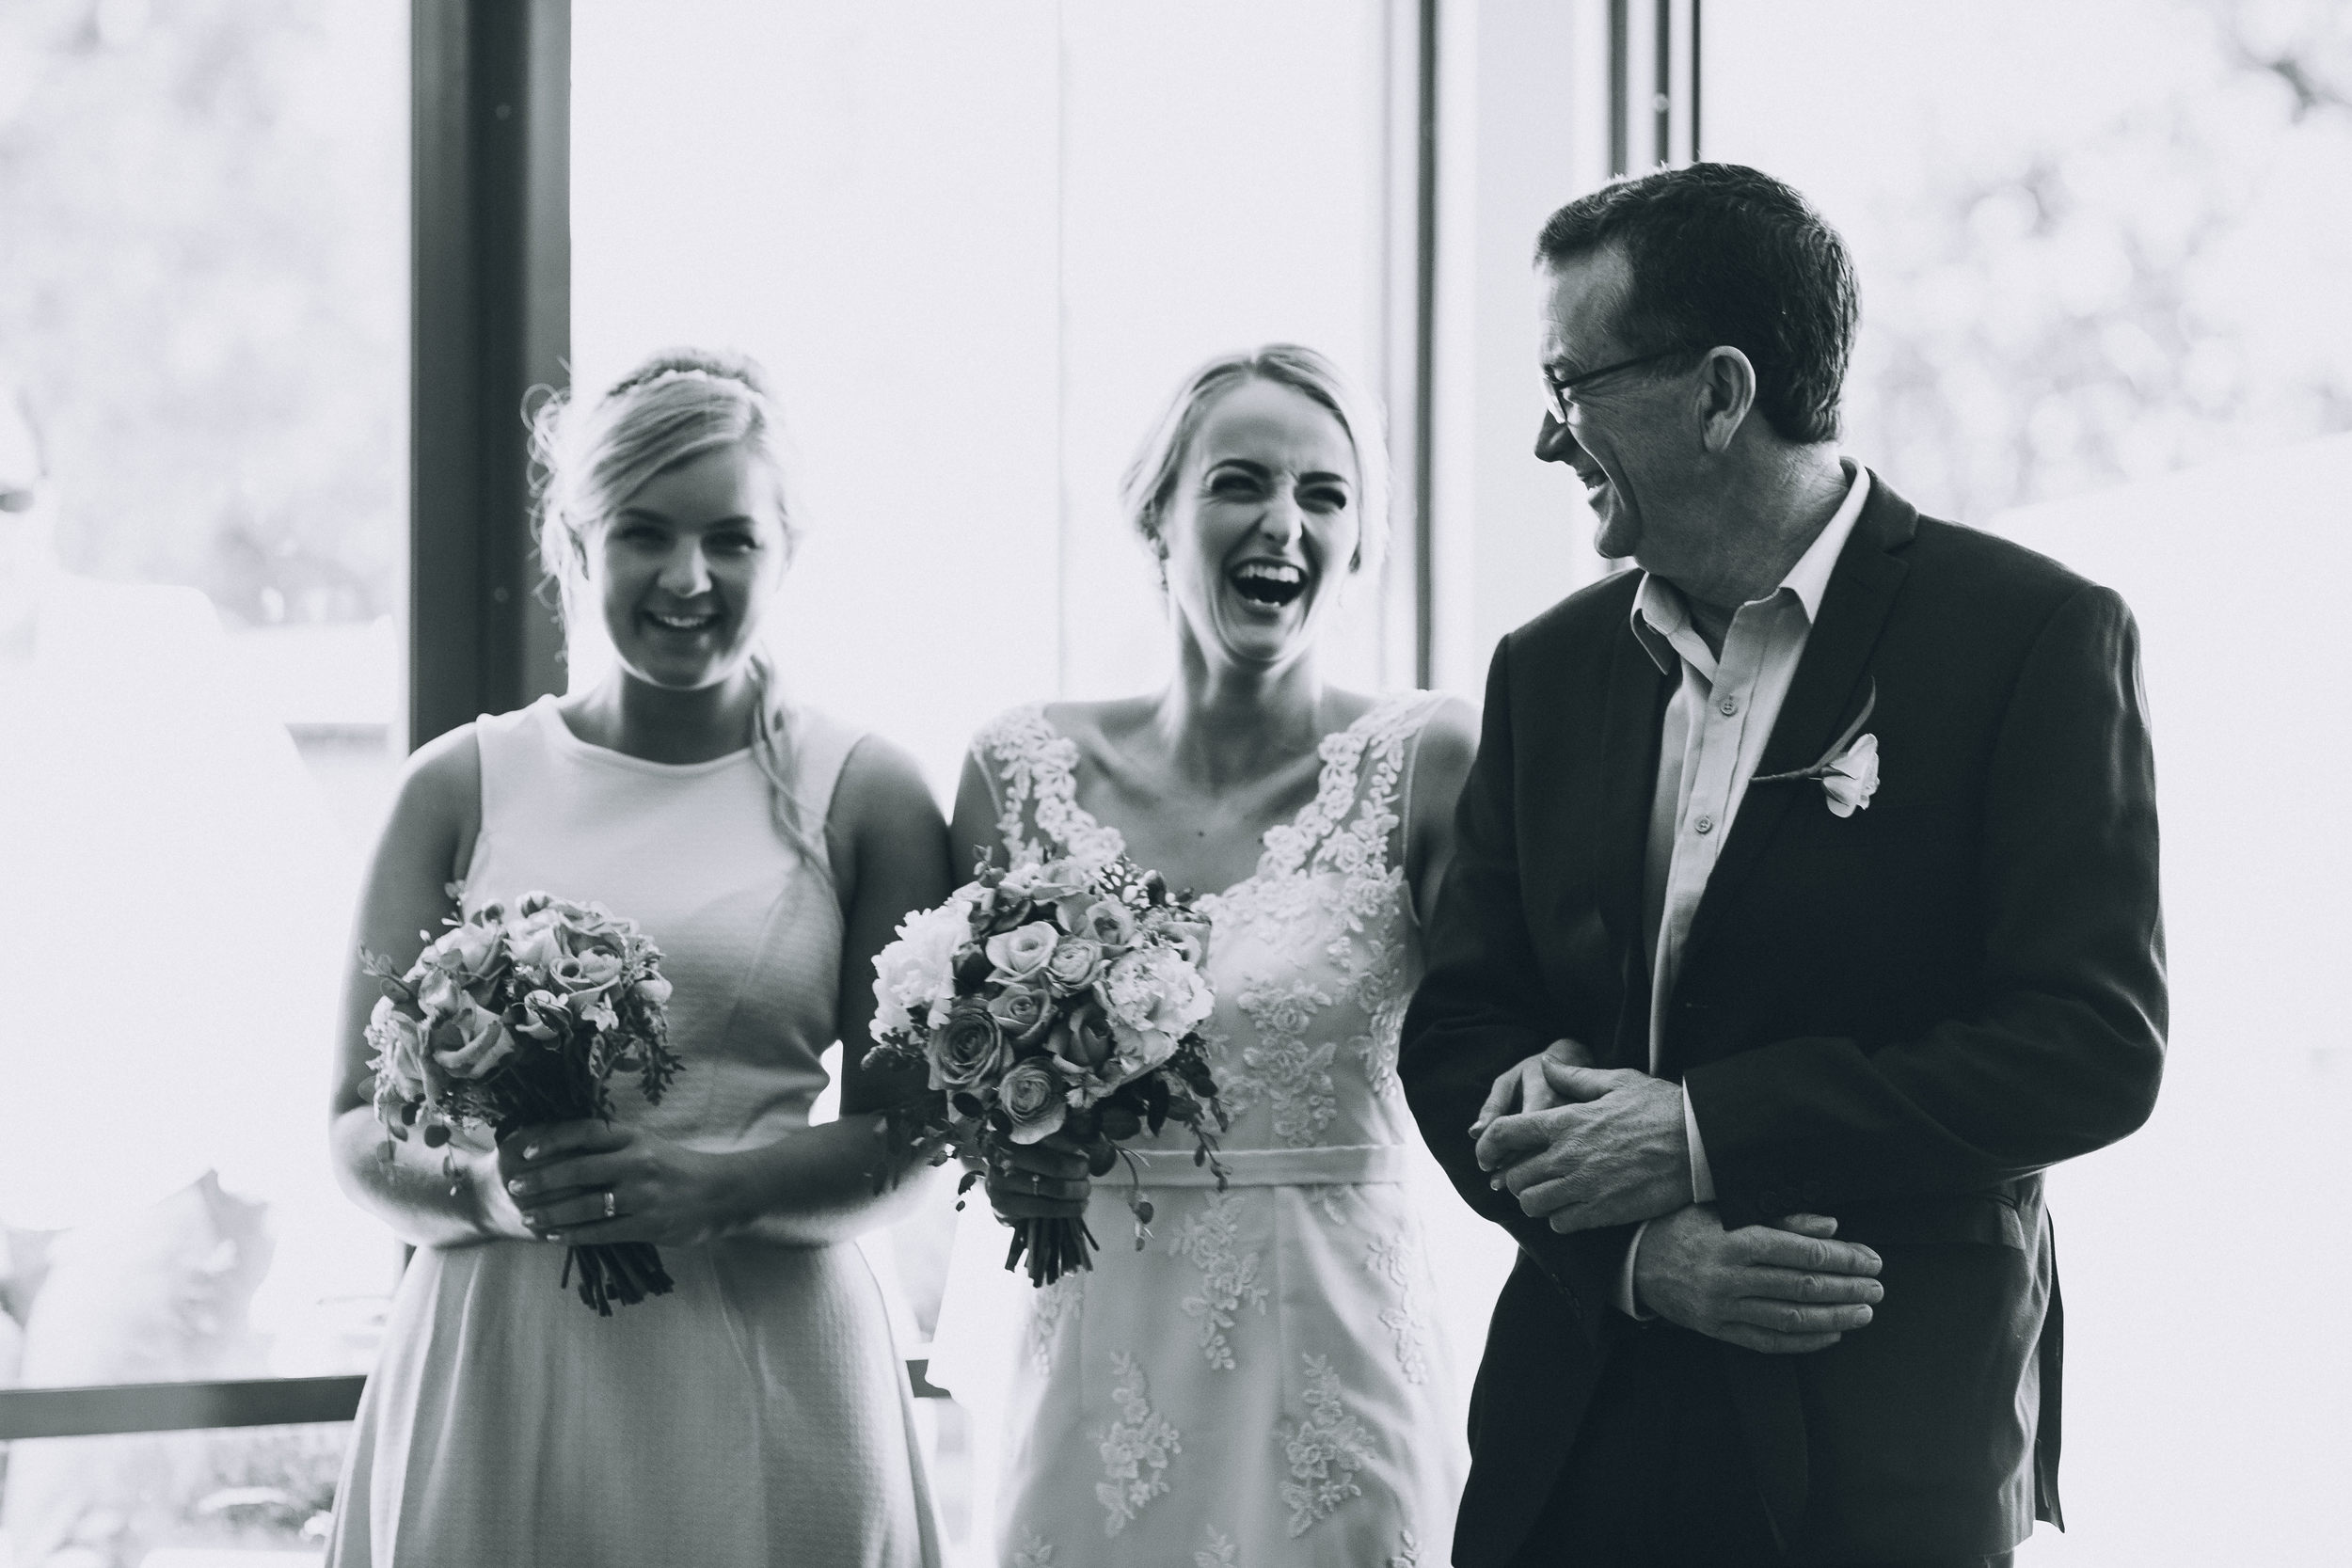 Shivonne & James - Ceremony Monochrome-108.jpg